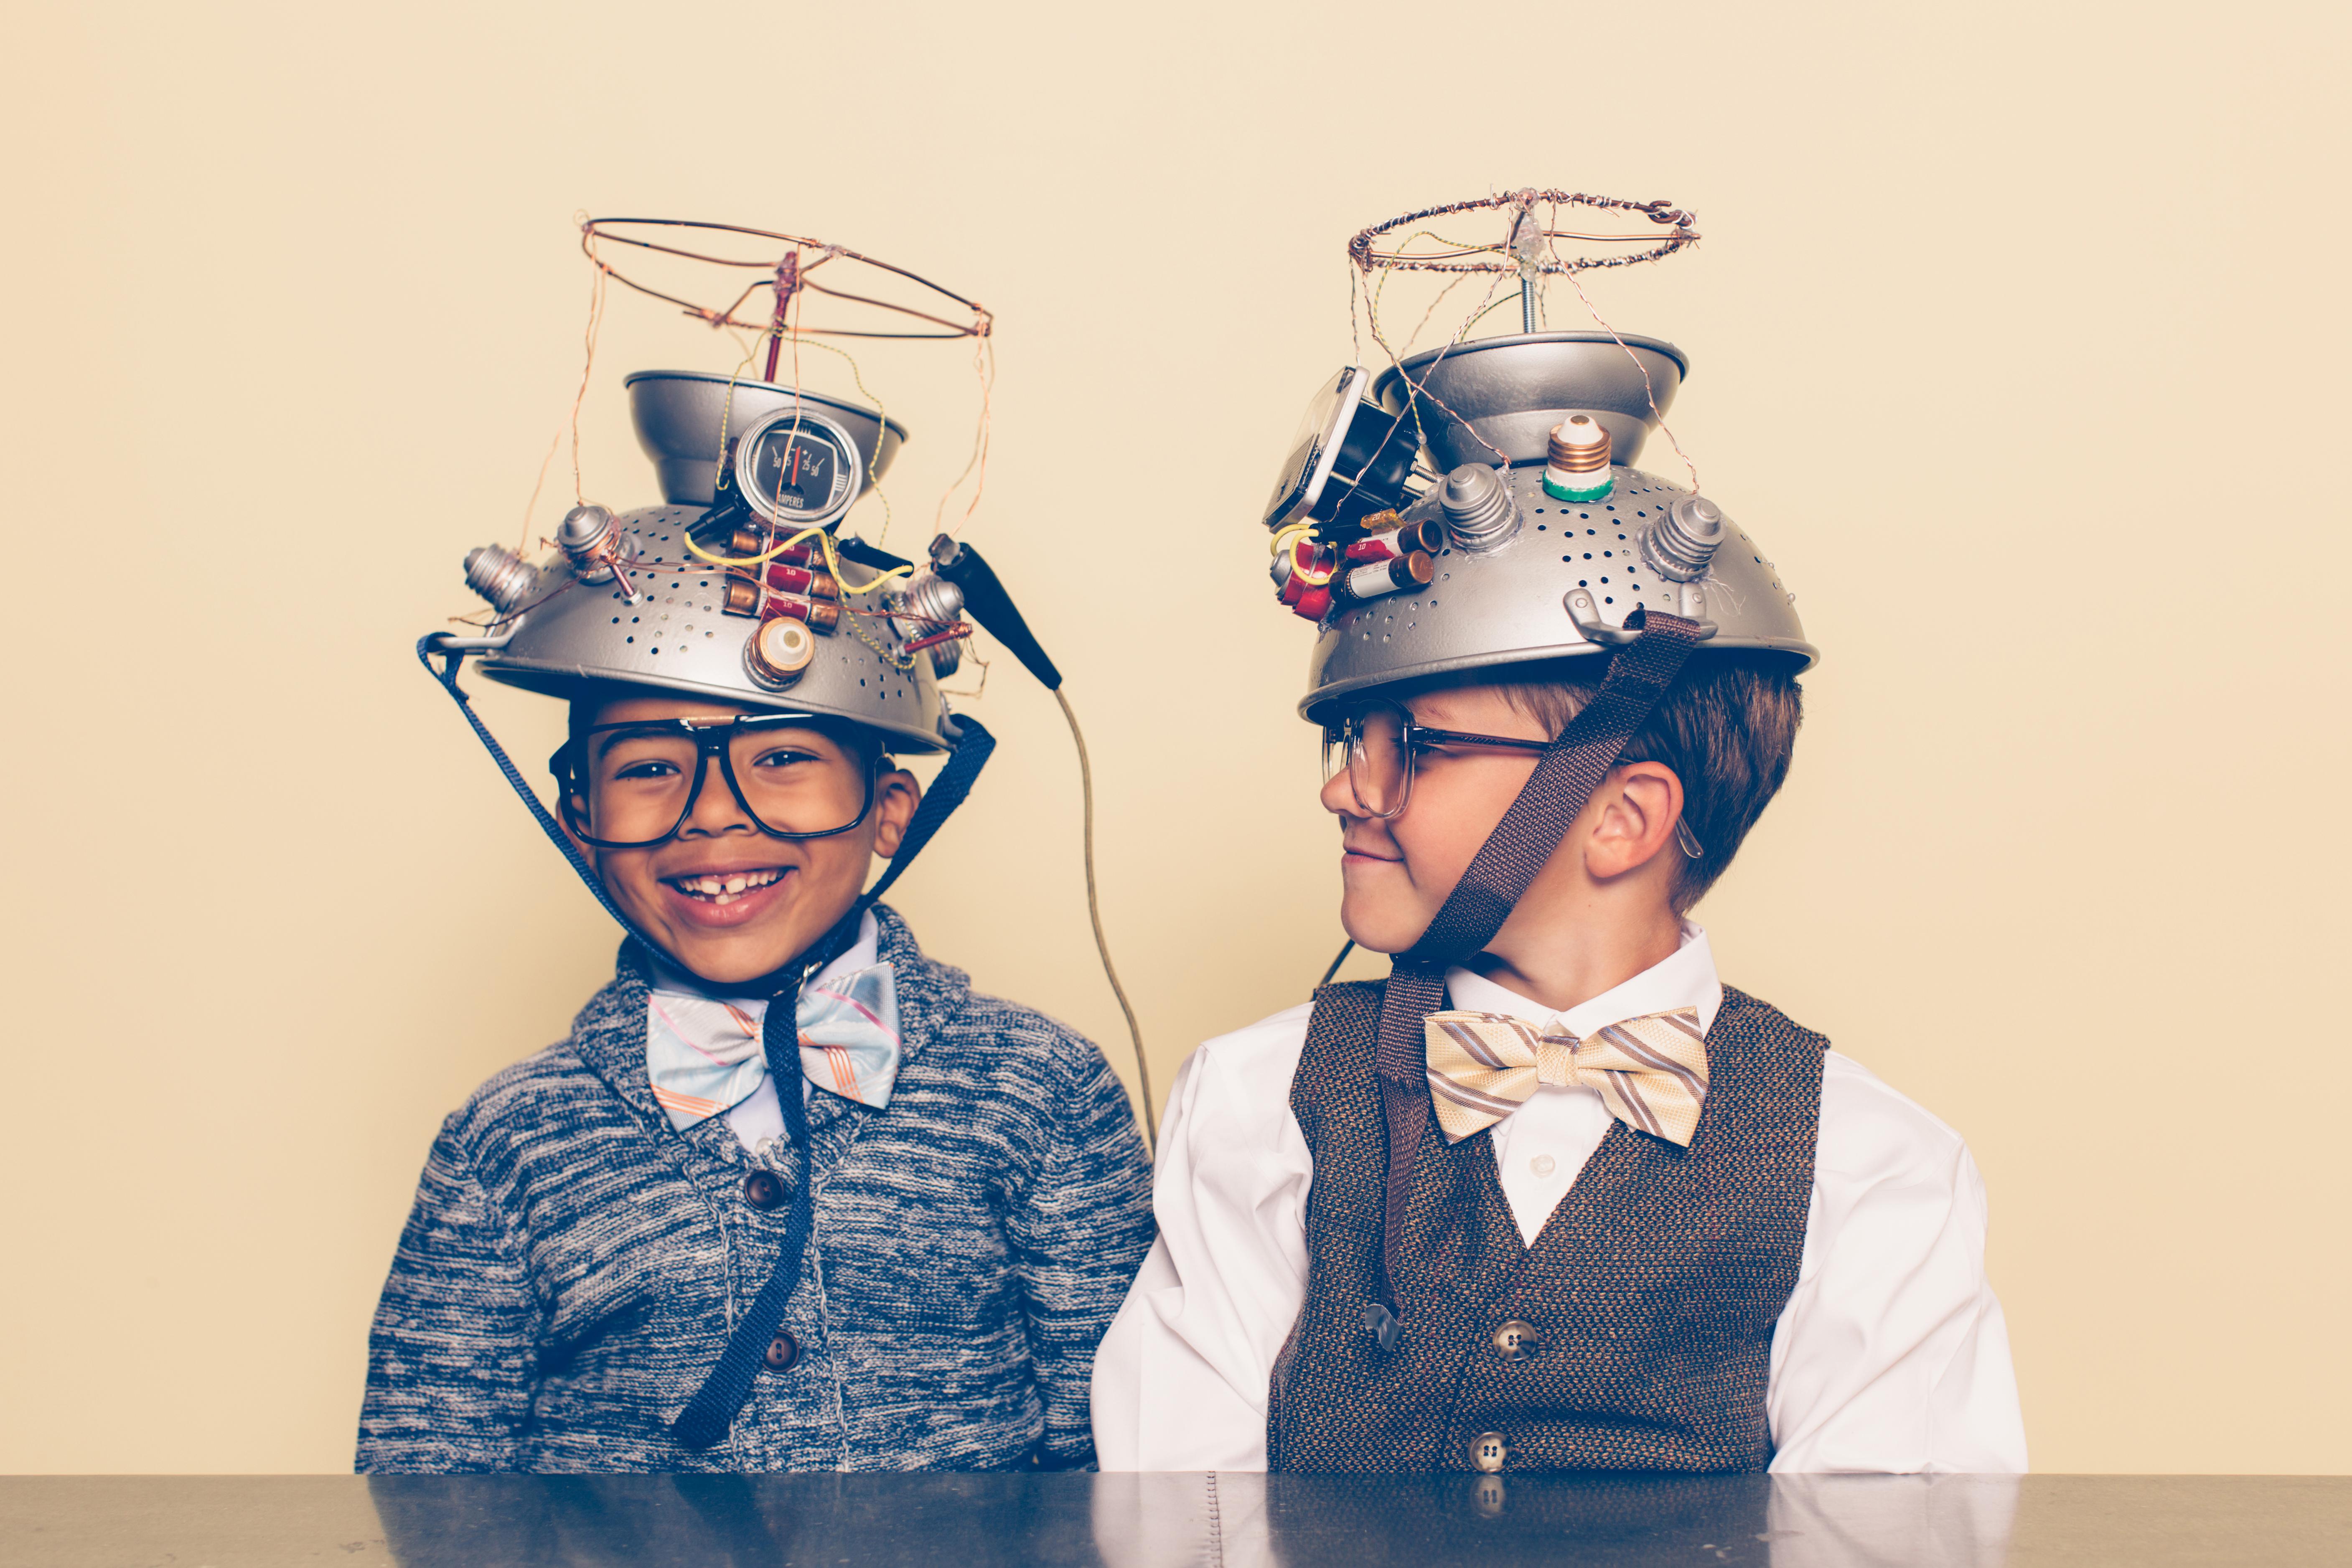 iStock-545249650-kids-helmets-technology